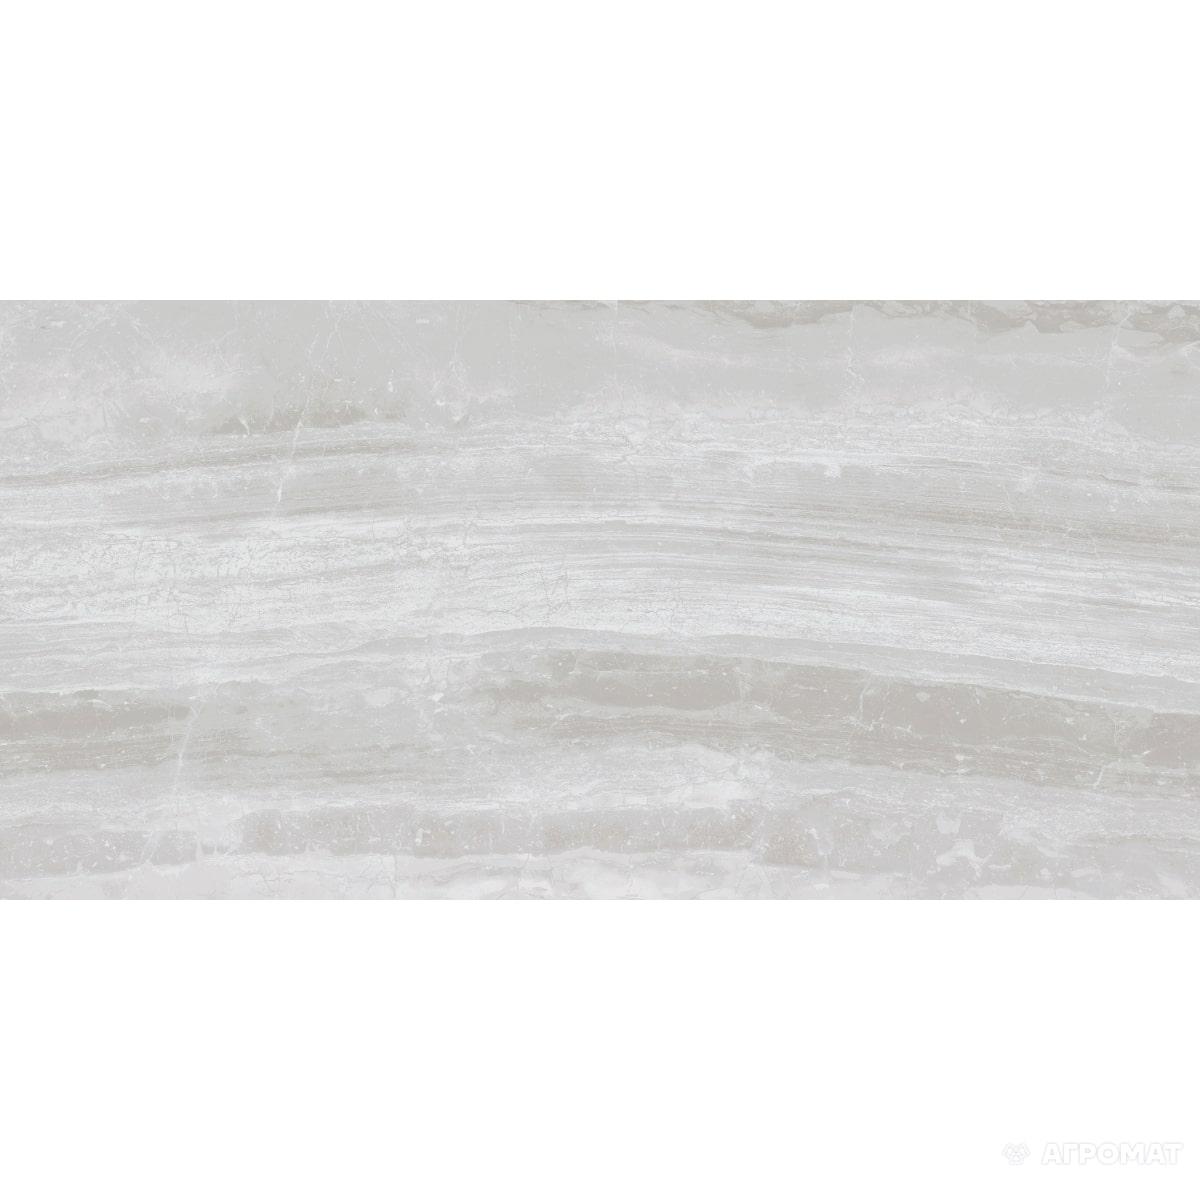 Плитка Geotiles EYRE MARFIL POL RECT (FAM 004) 60х120